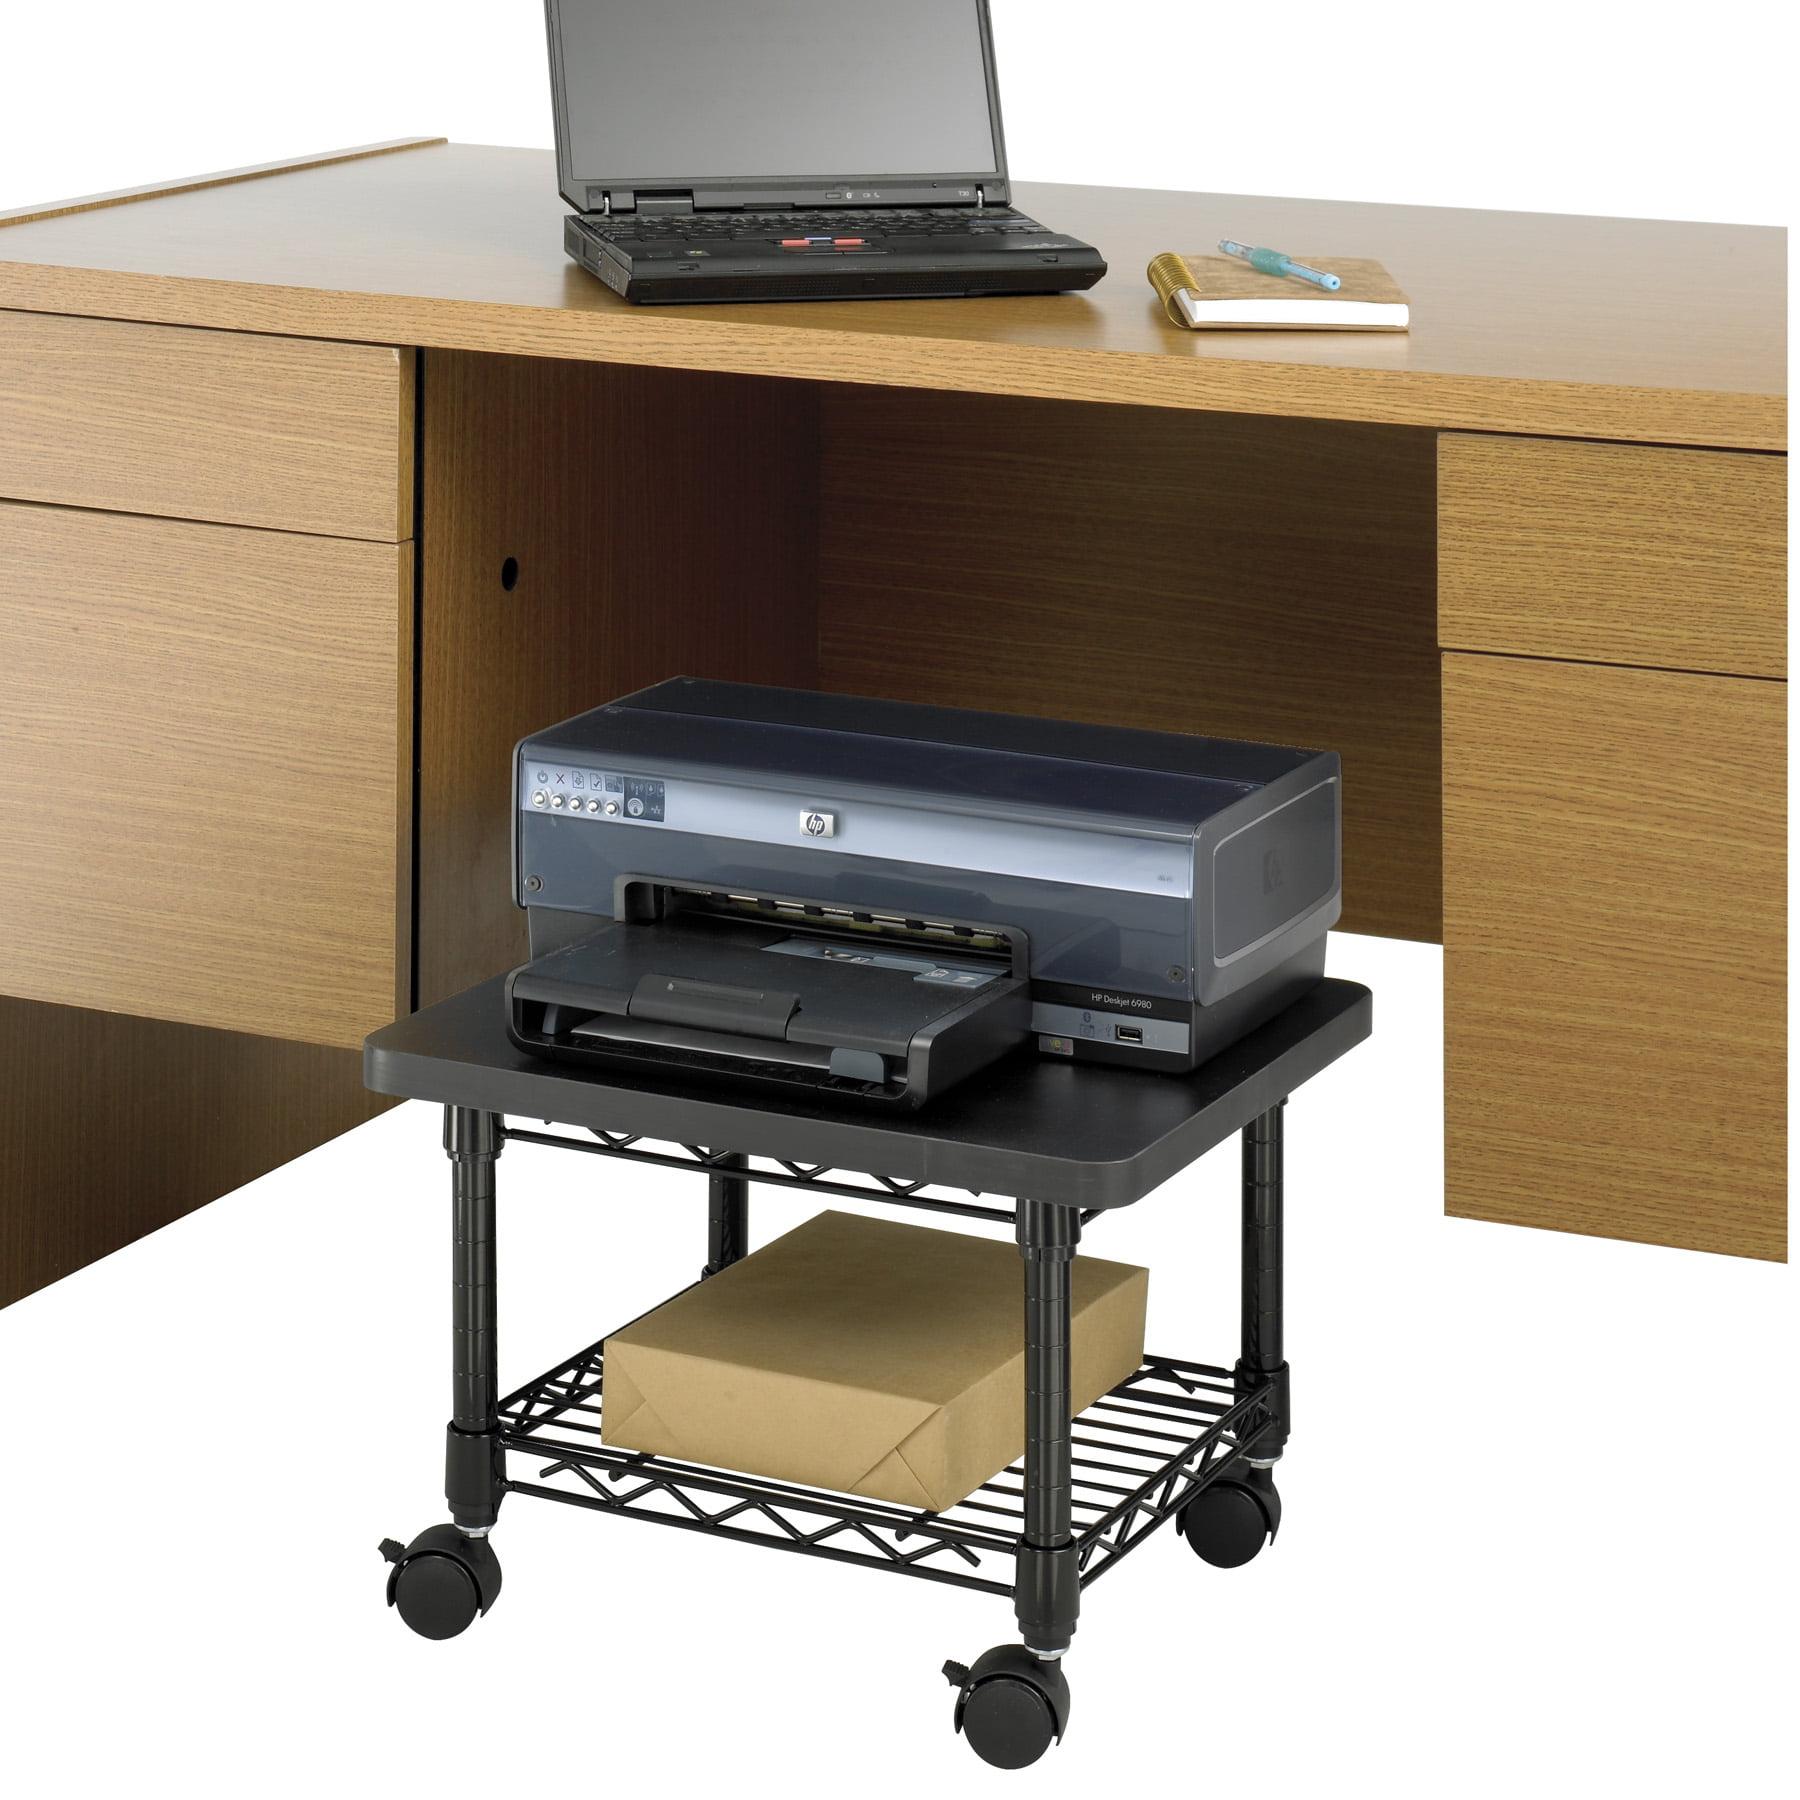 Safco Under Desk Printer Fax Stand Multiple Colors Walmart Com